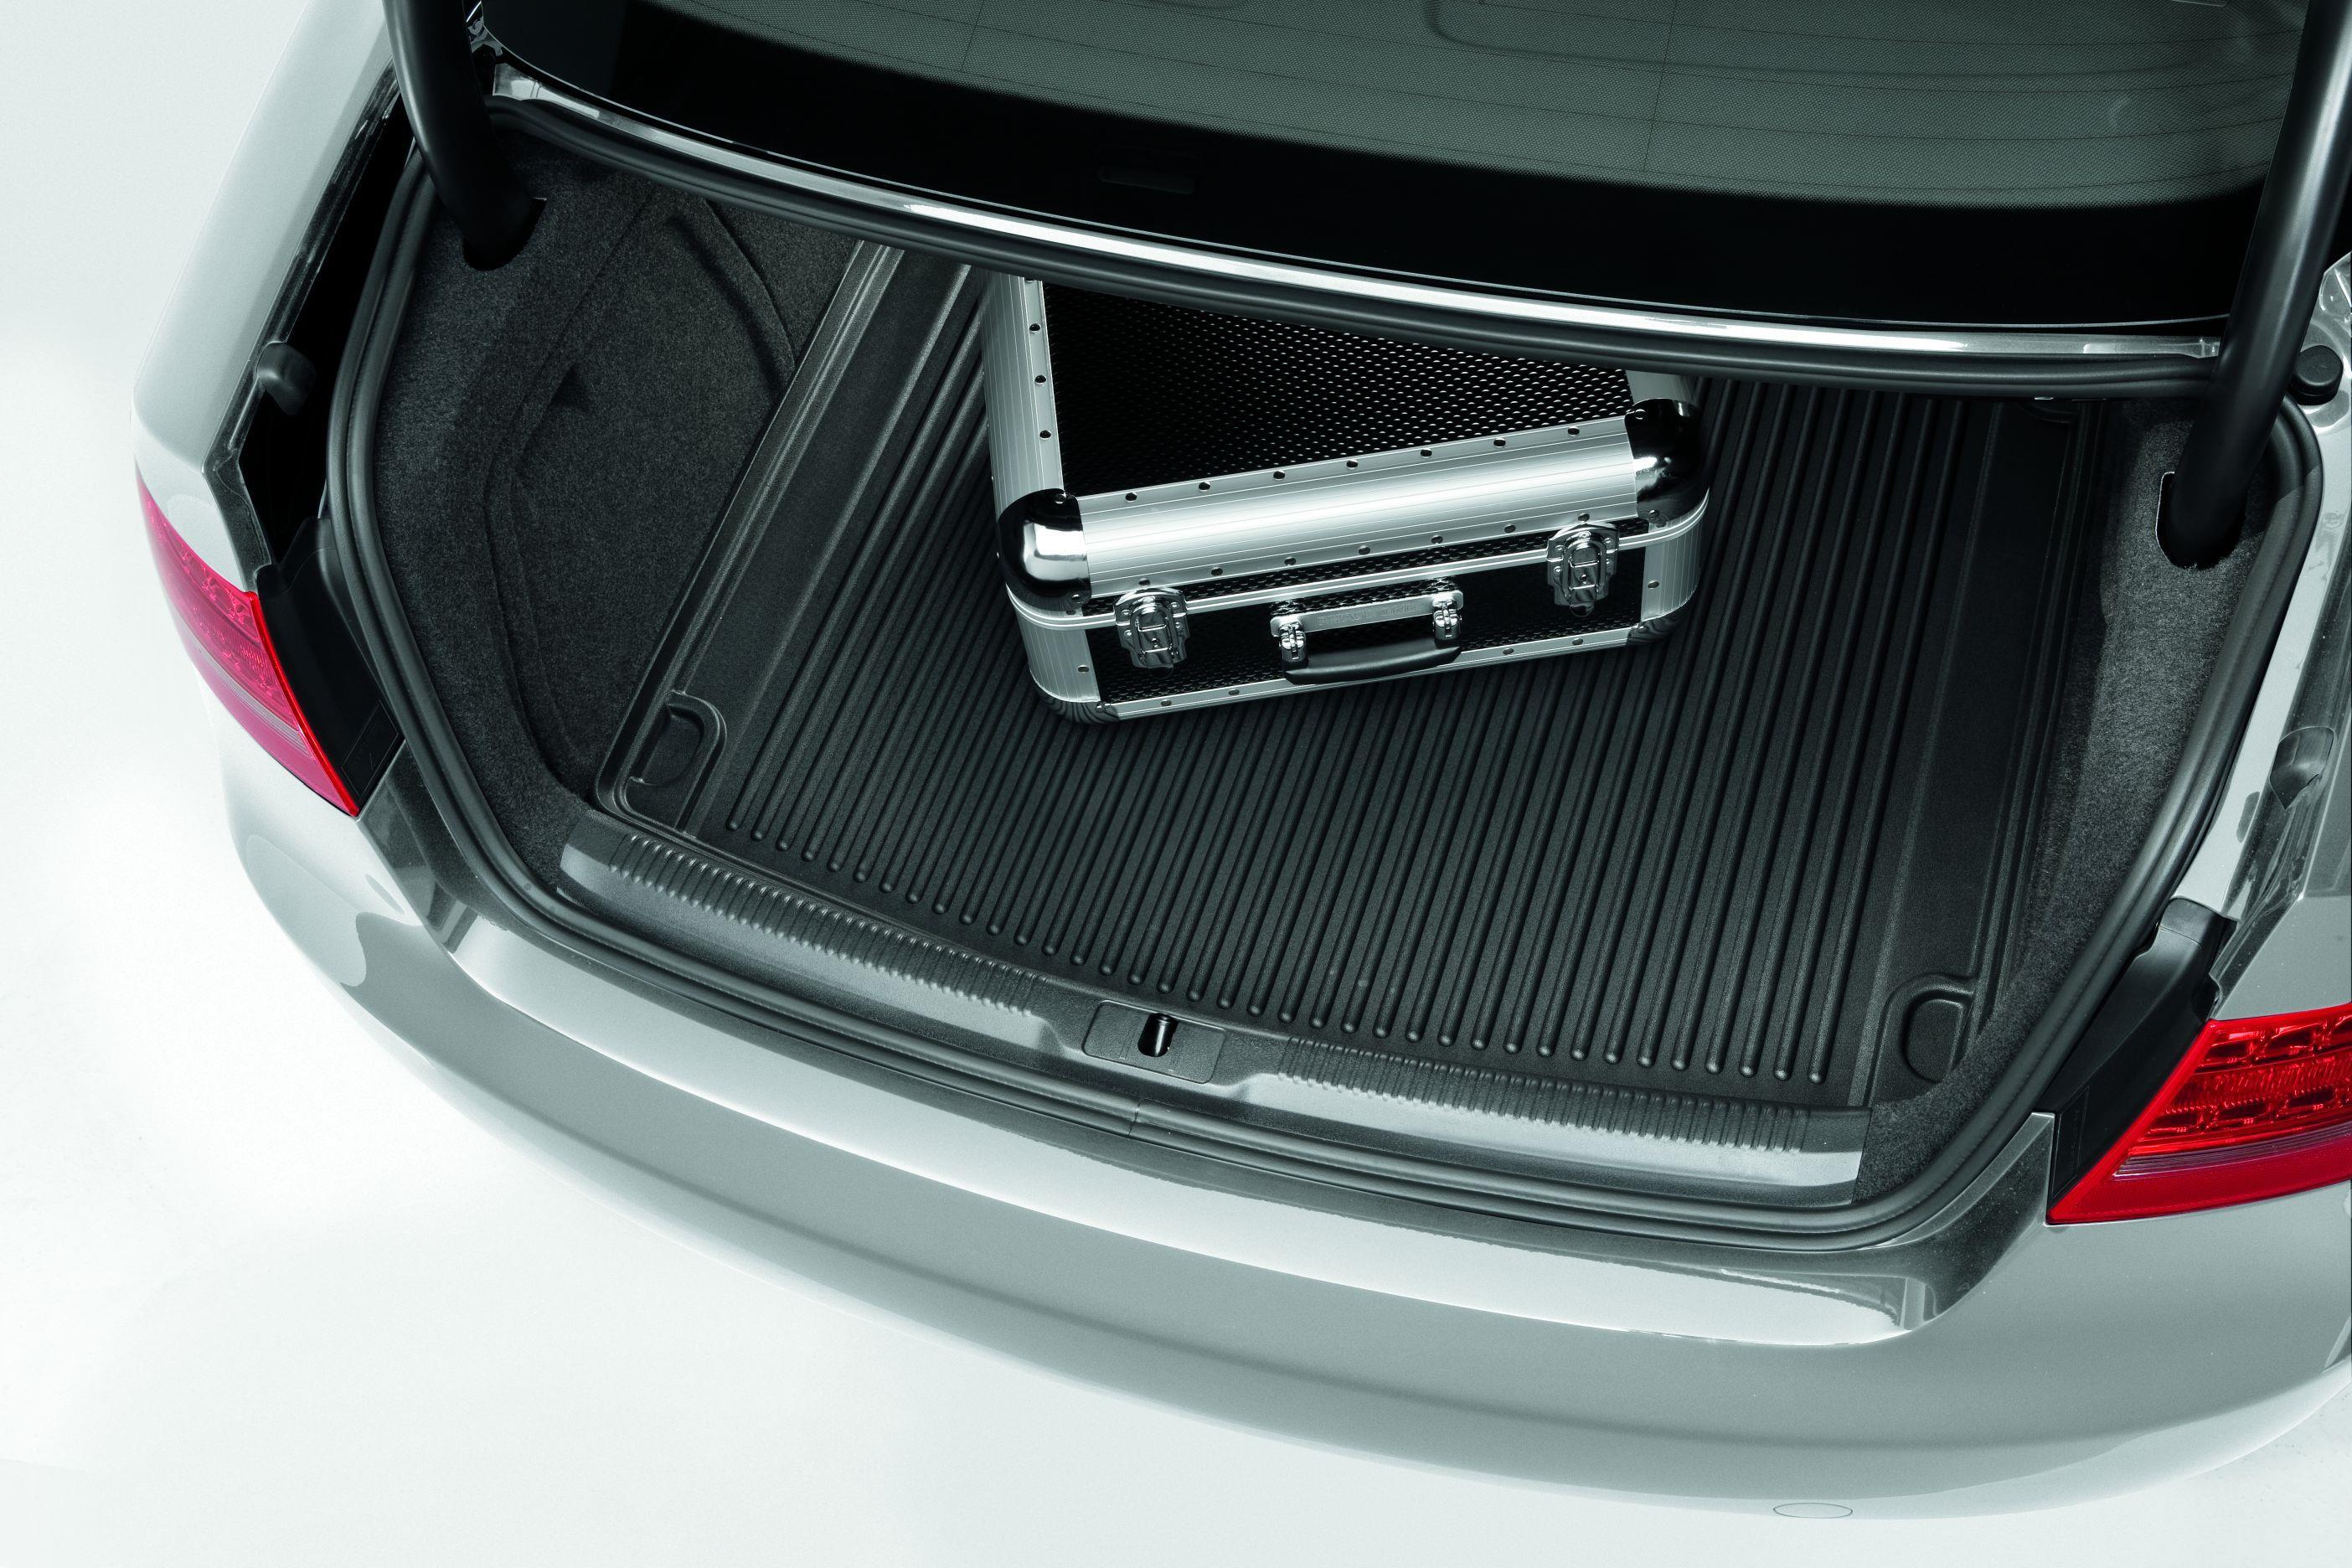 search 2010 audi parts rh jimellisaudiparts com 2008 Audi A4 Manual Audi A4 6-Speed Manual